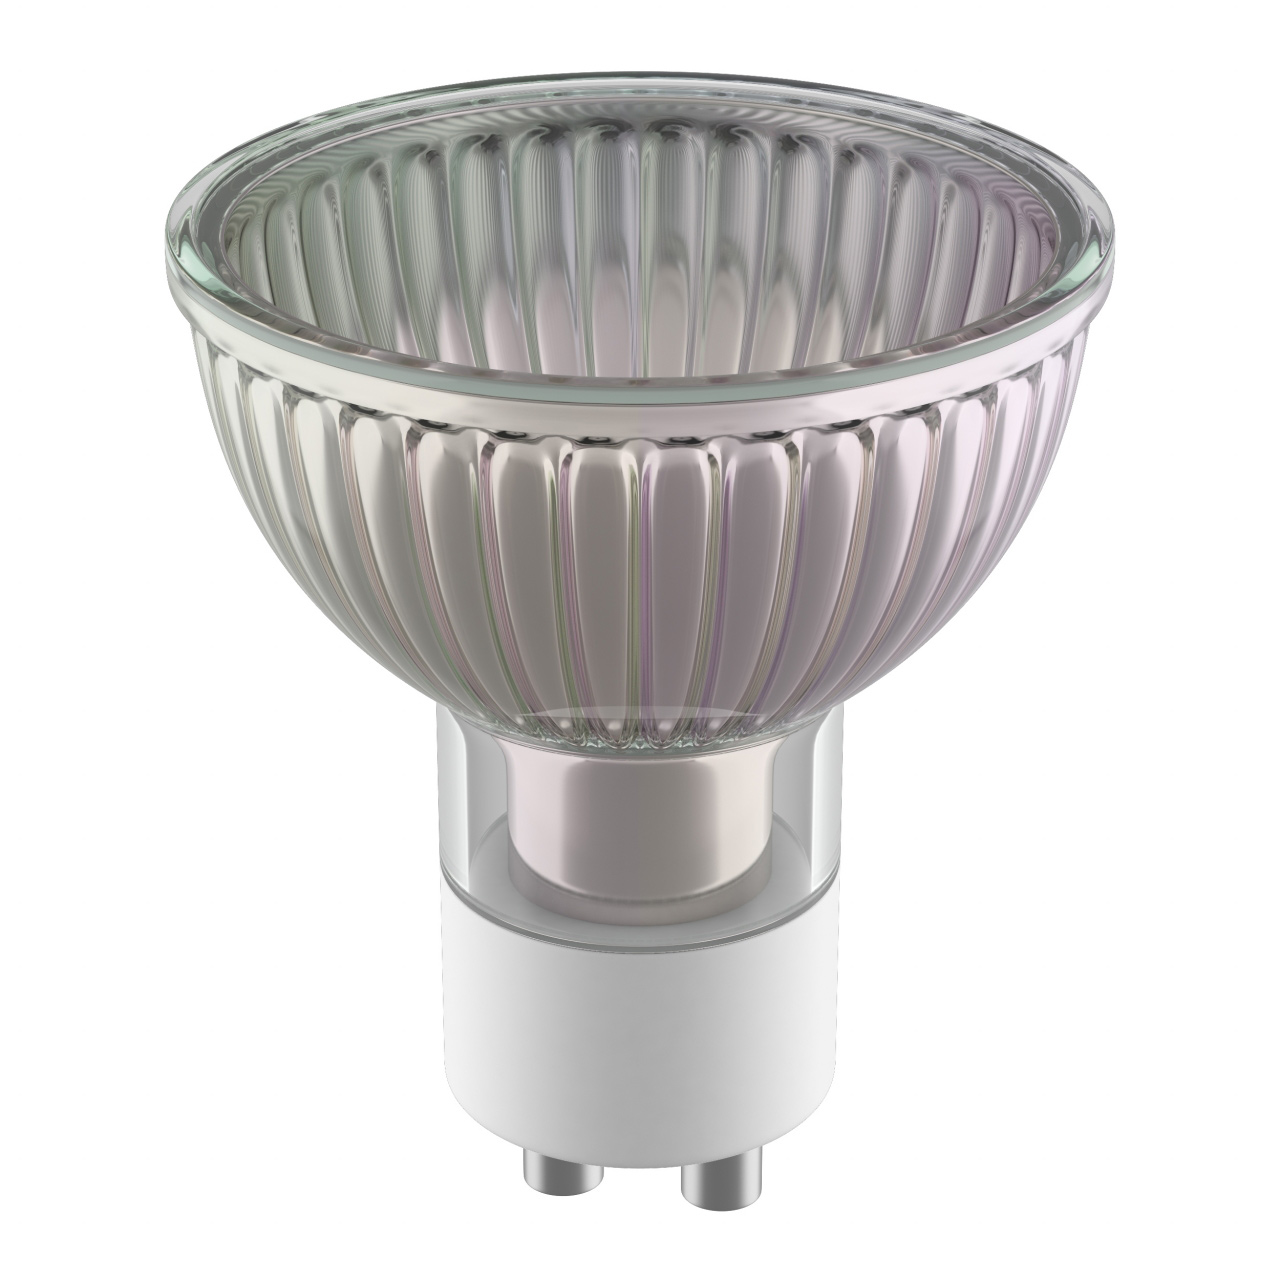 Лампа HAL 220V HP16 GU10 50W 40G DICHR RA100 2800K 2000H DIMM Lightstar 922007